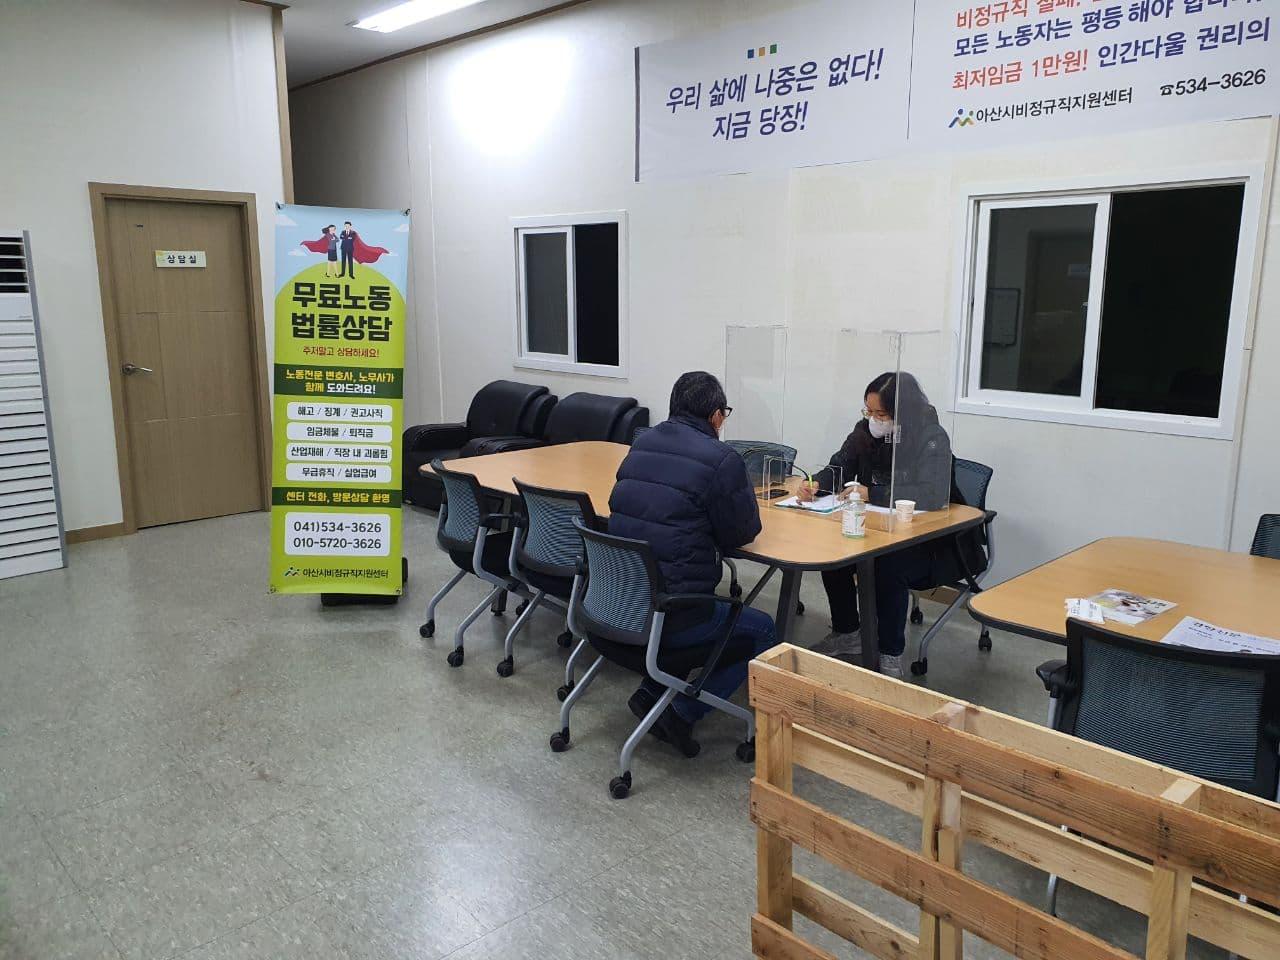 photo_2020-11-19_16-15-08.jpg